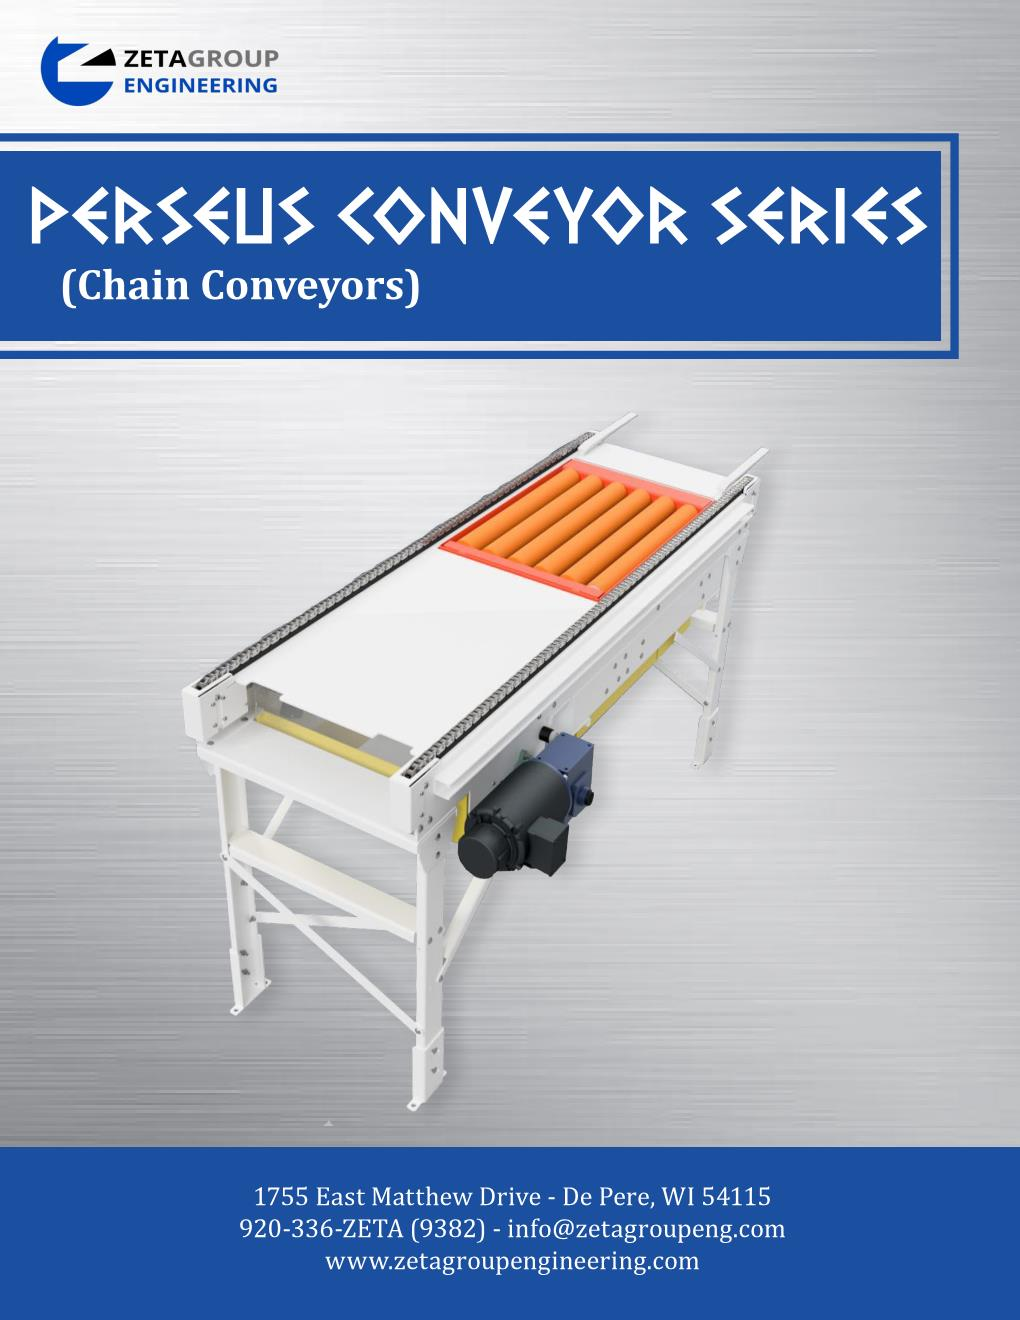 Chain Conveyor Brochure - Perseus Series